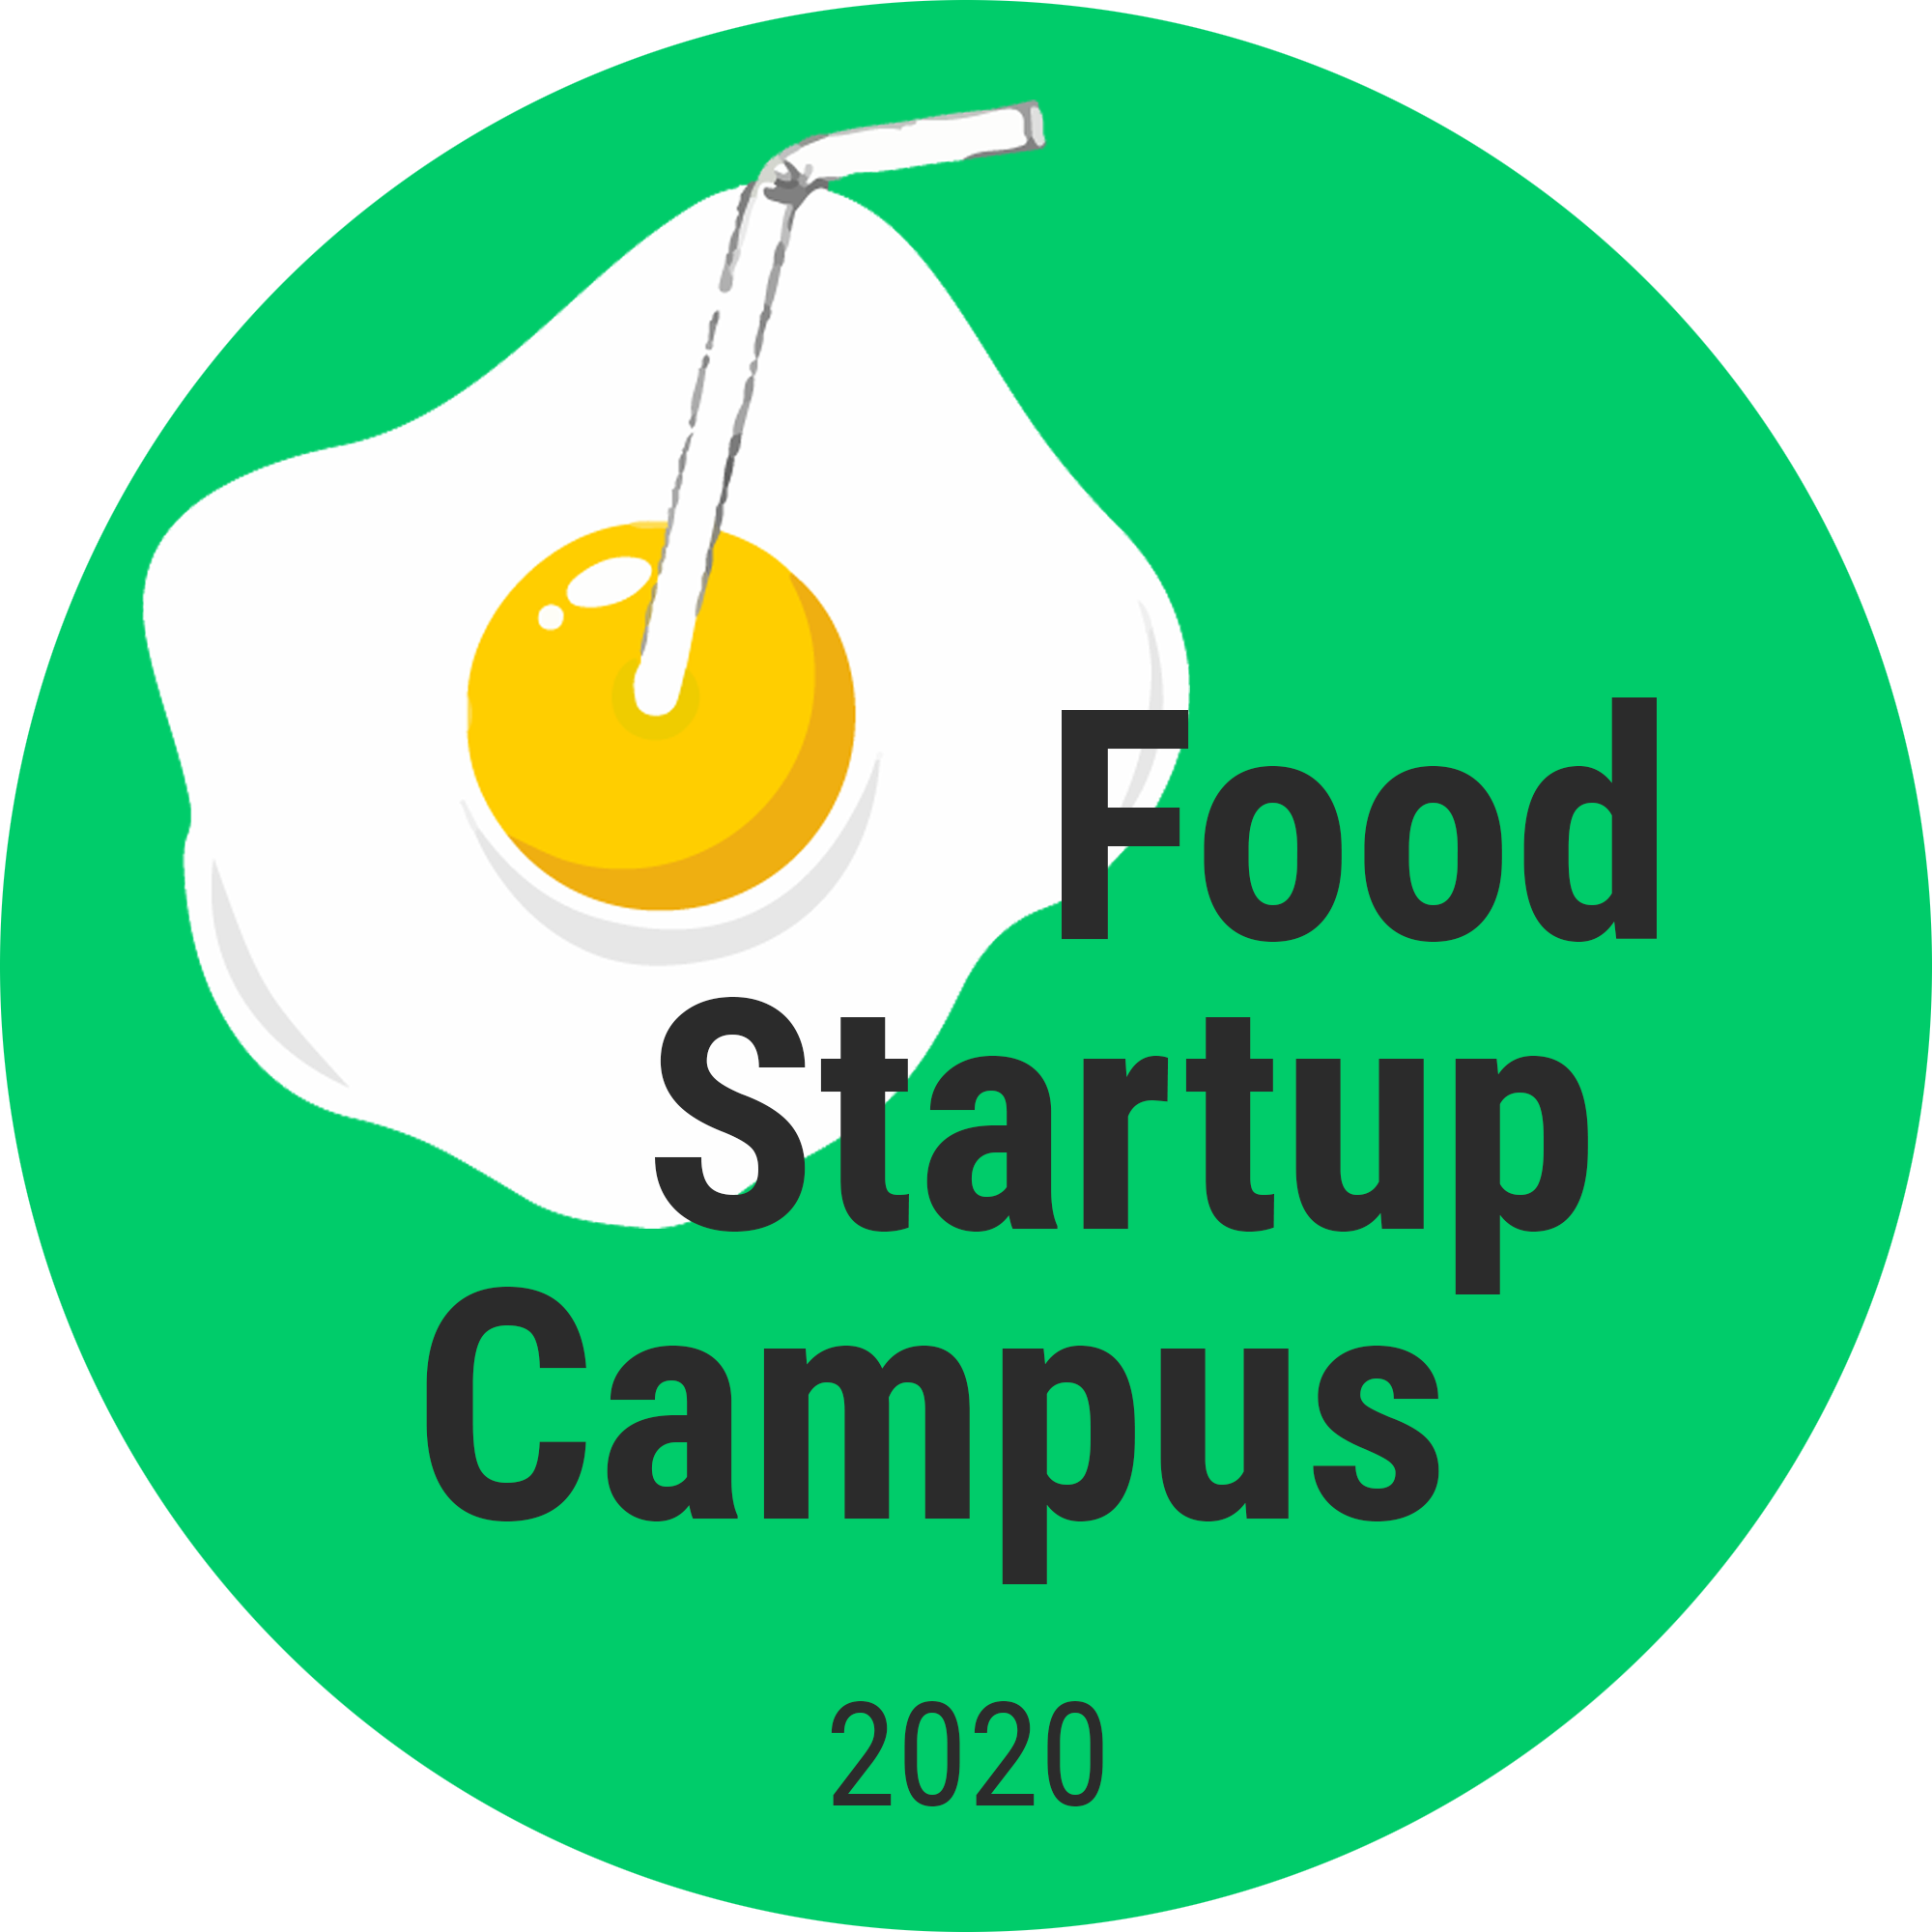 Foodstartup Campus